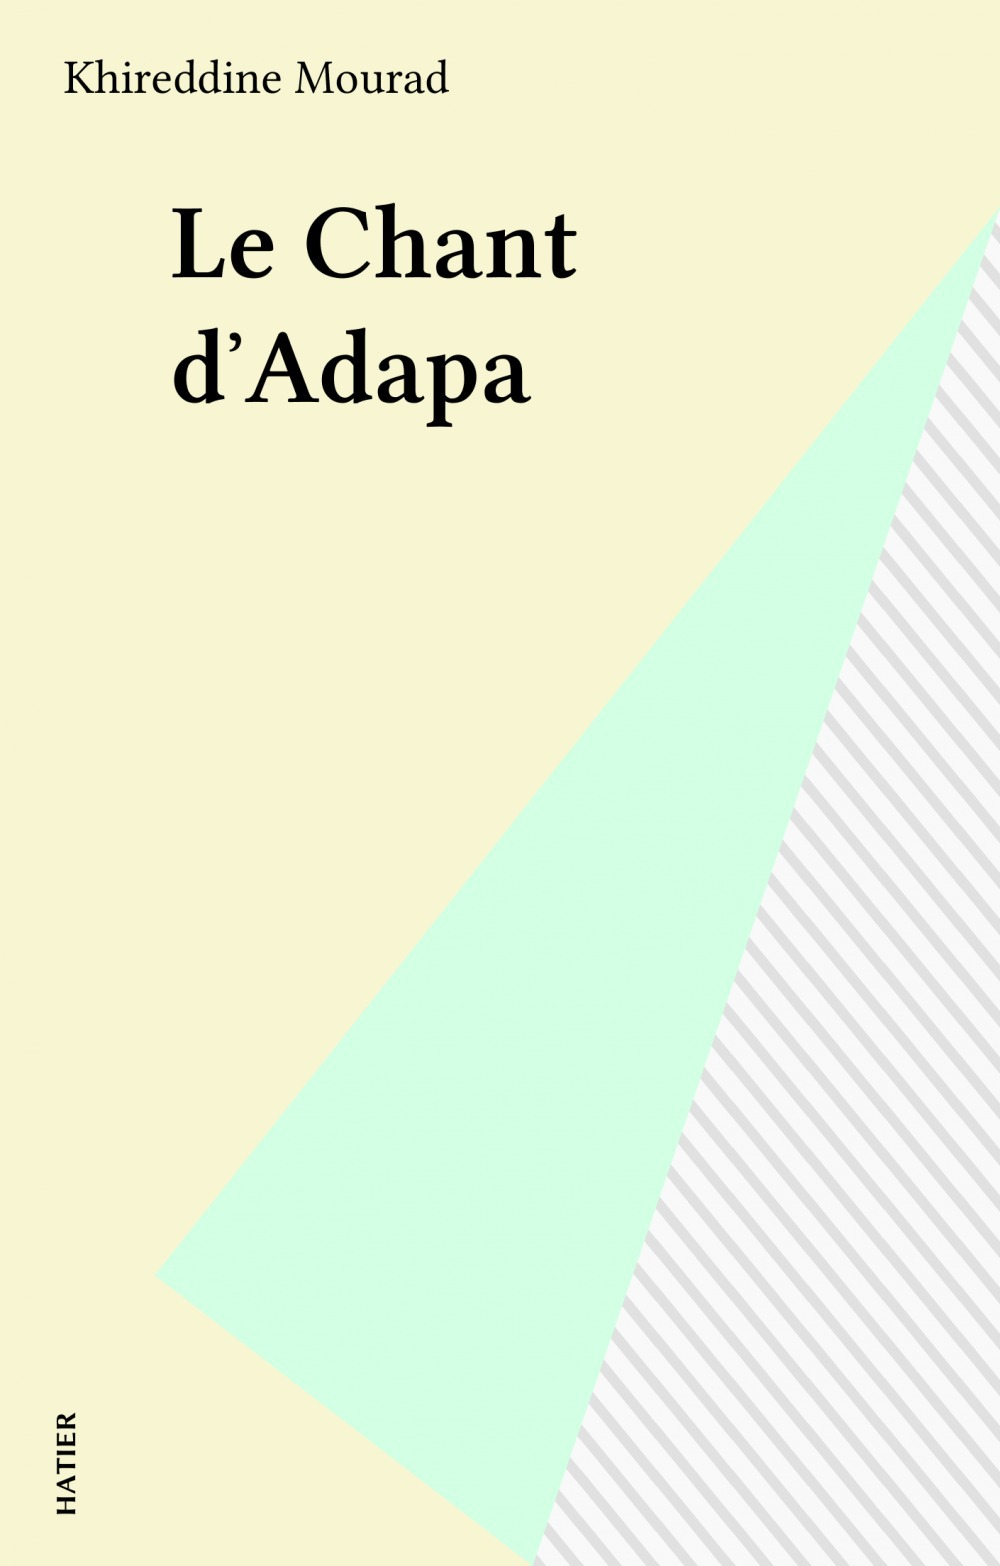 Le chant d'adapa